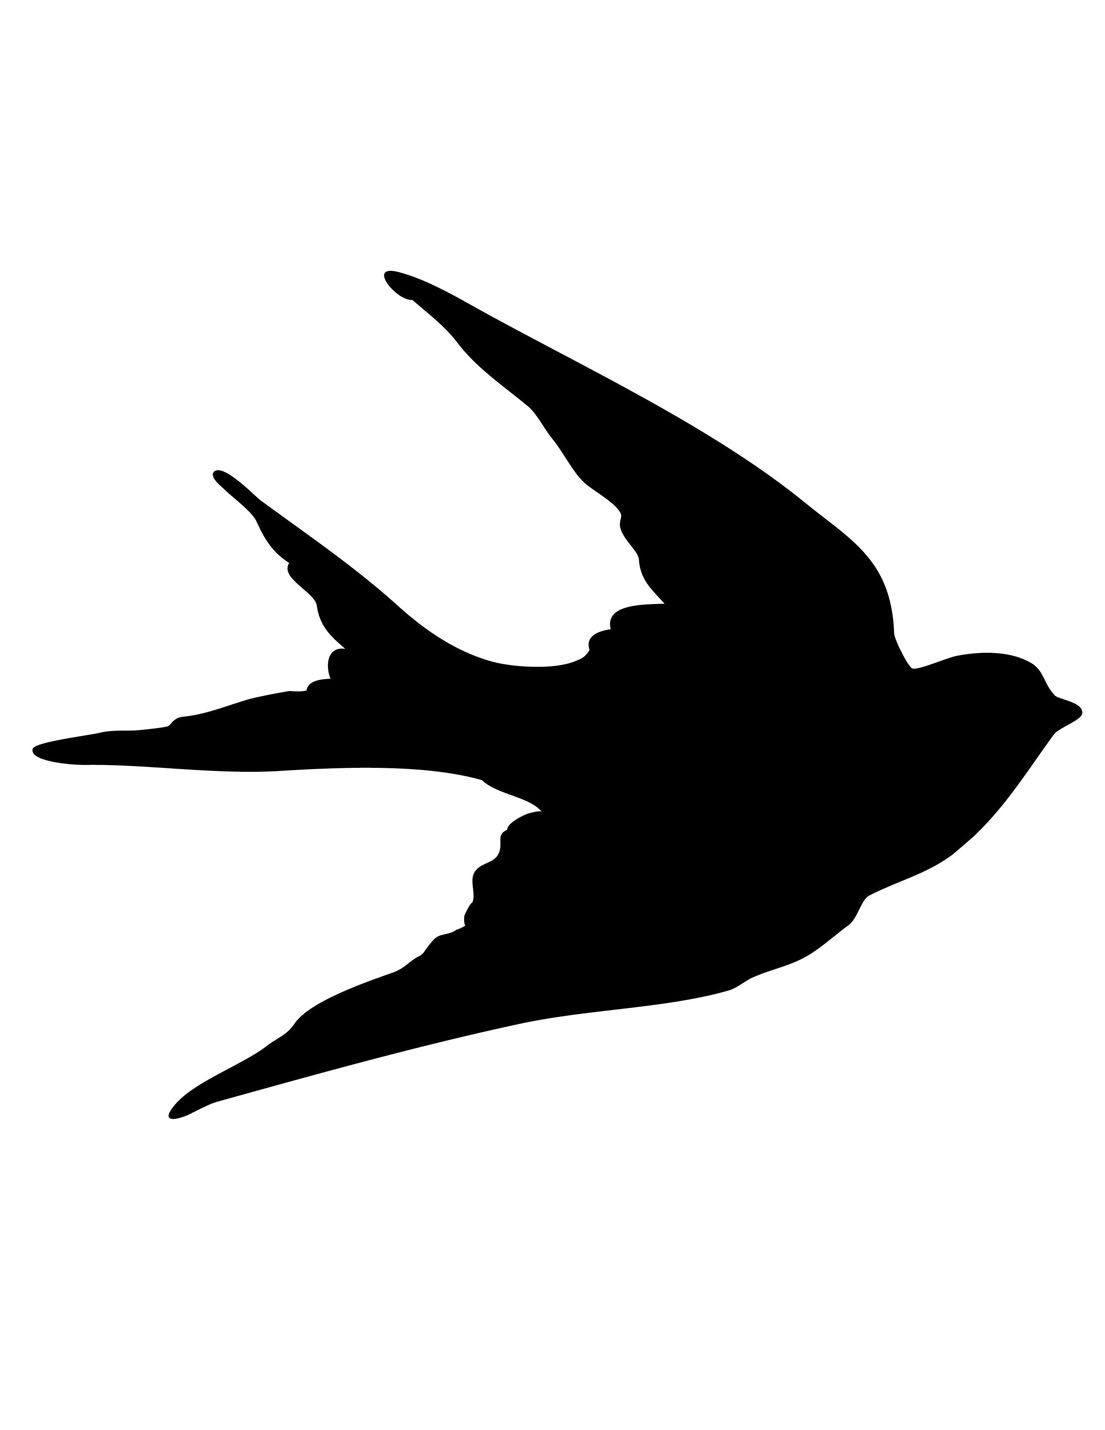 1105x1430 Birdcage Silhouette